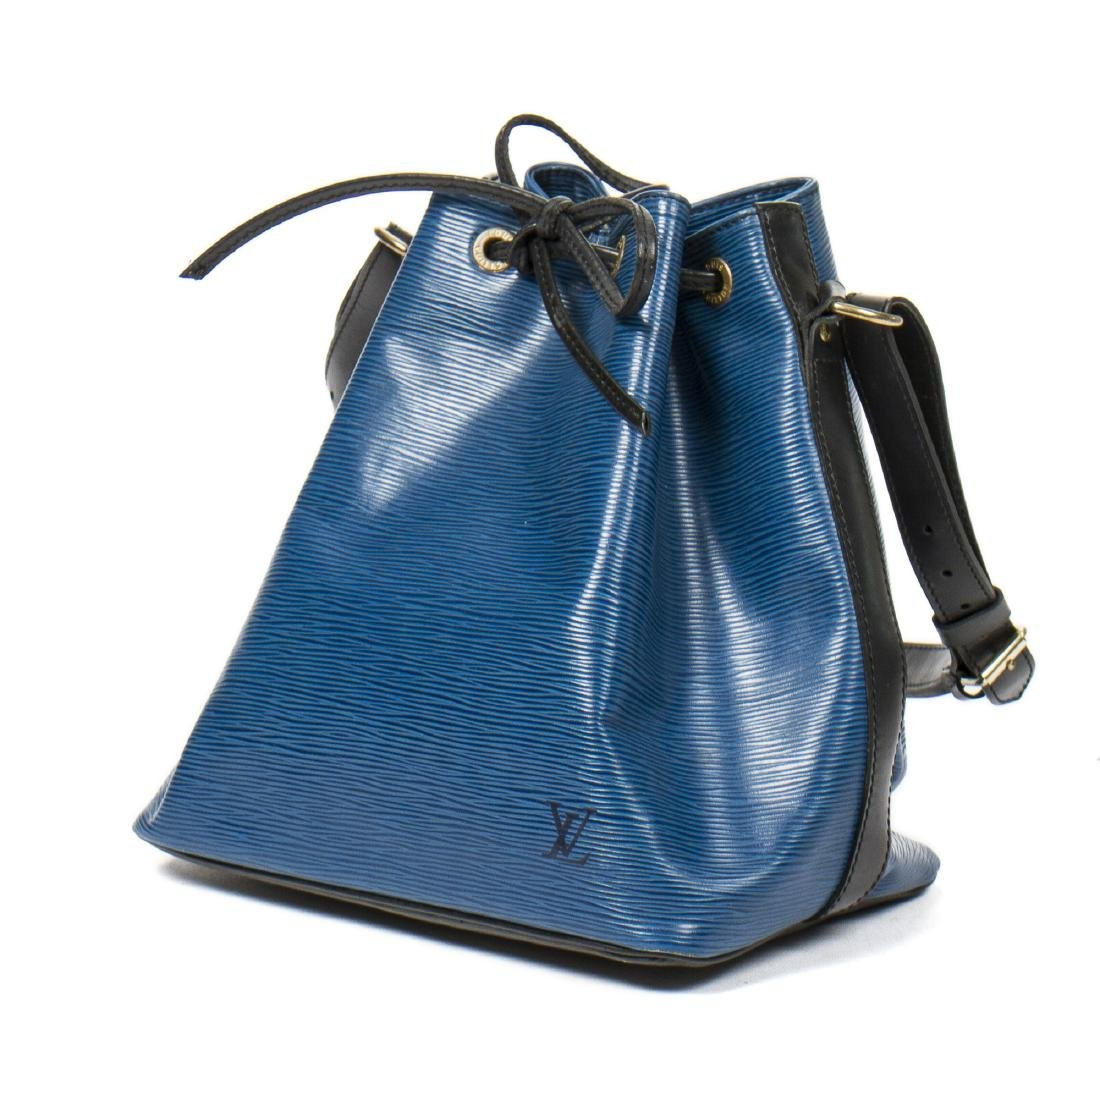 Louis Vuitton Noe Bicolor - 2